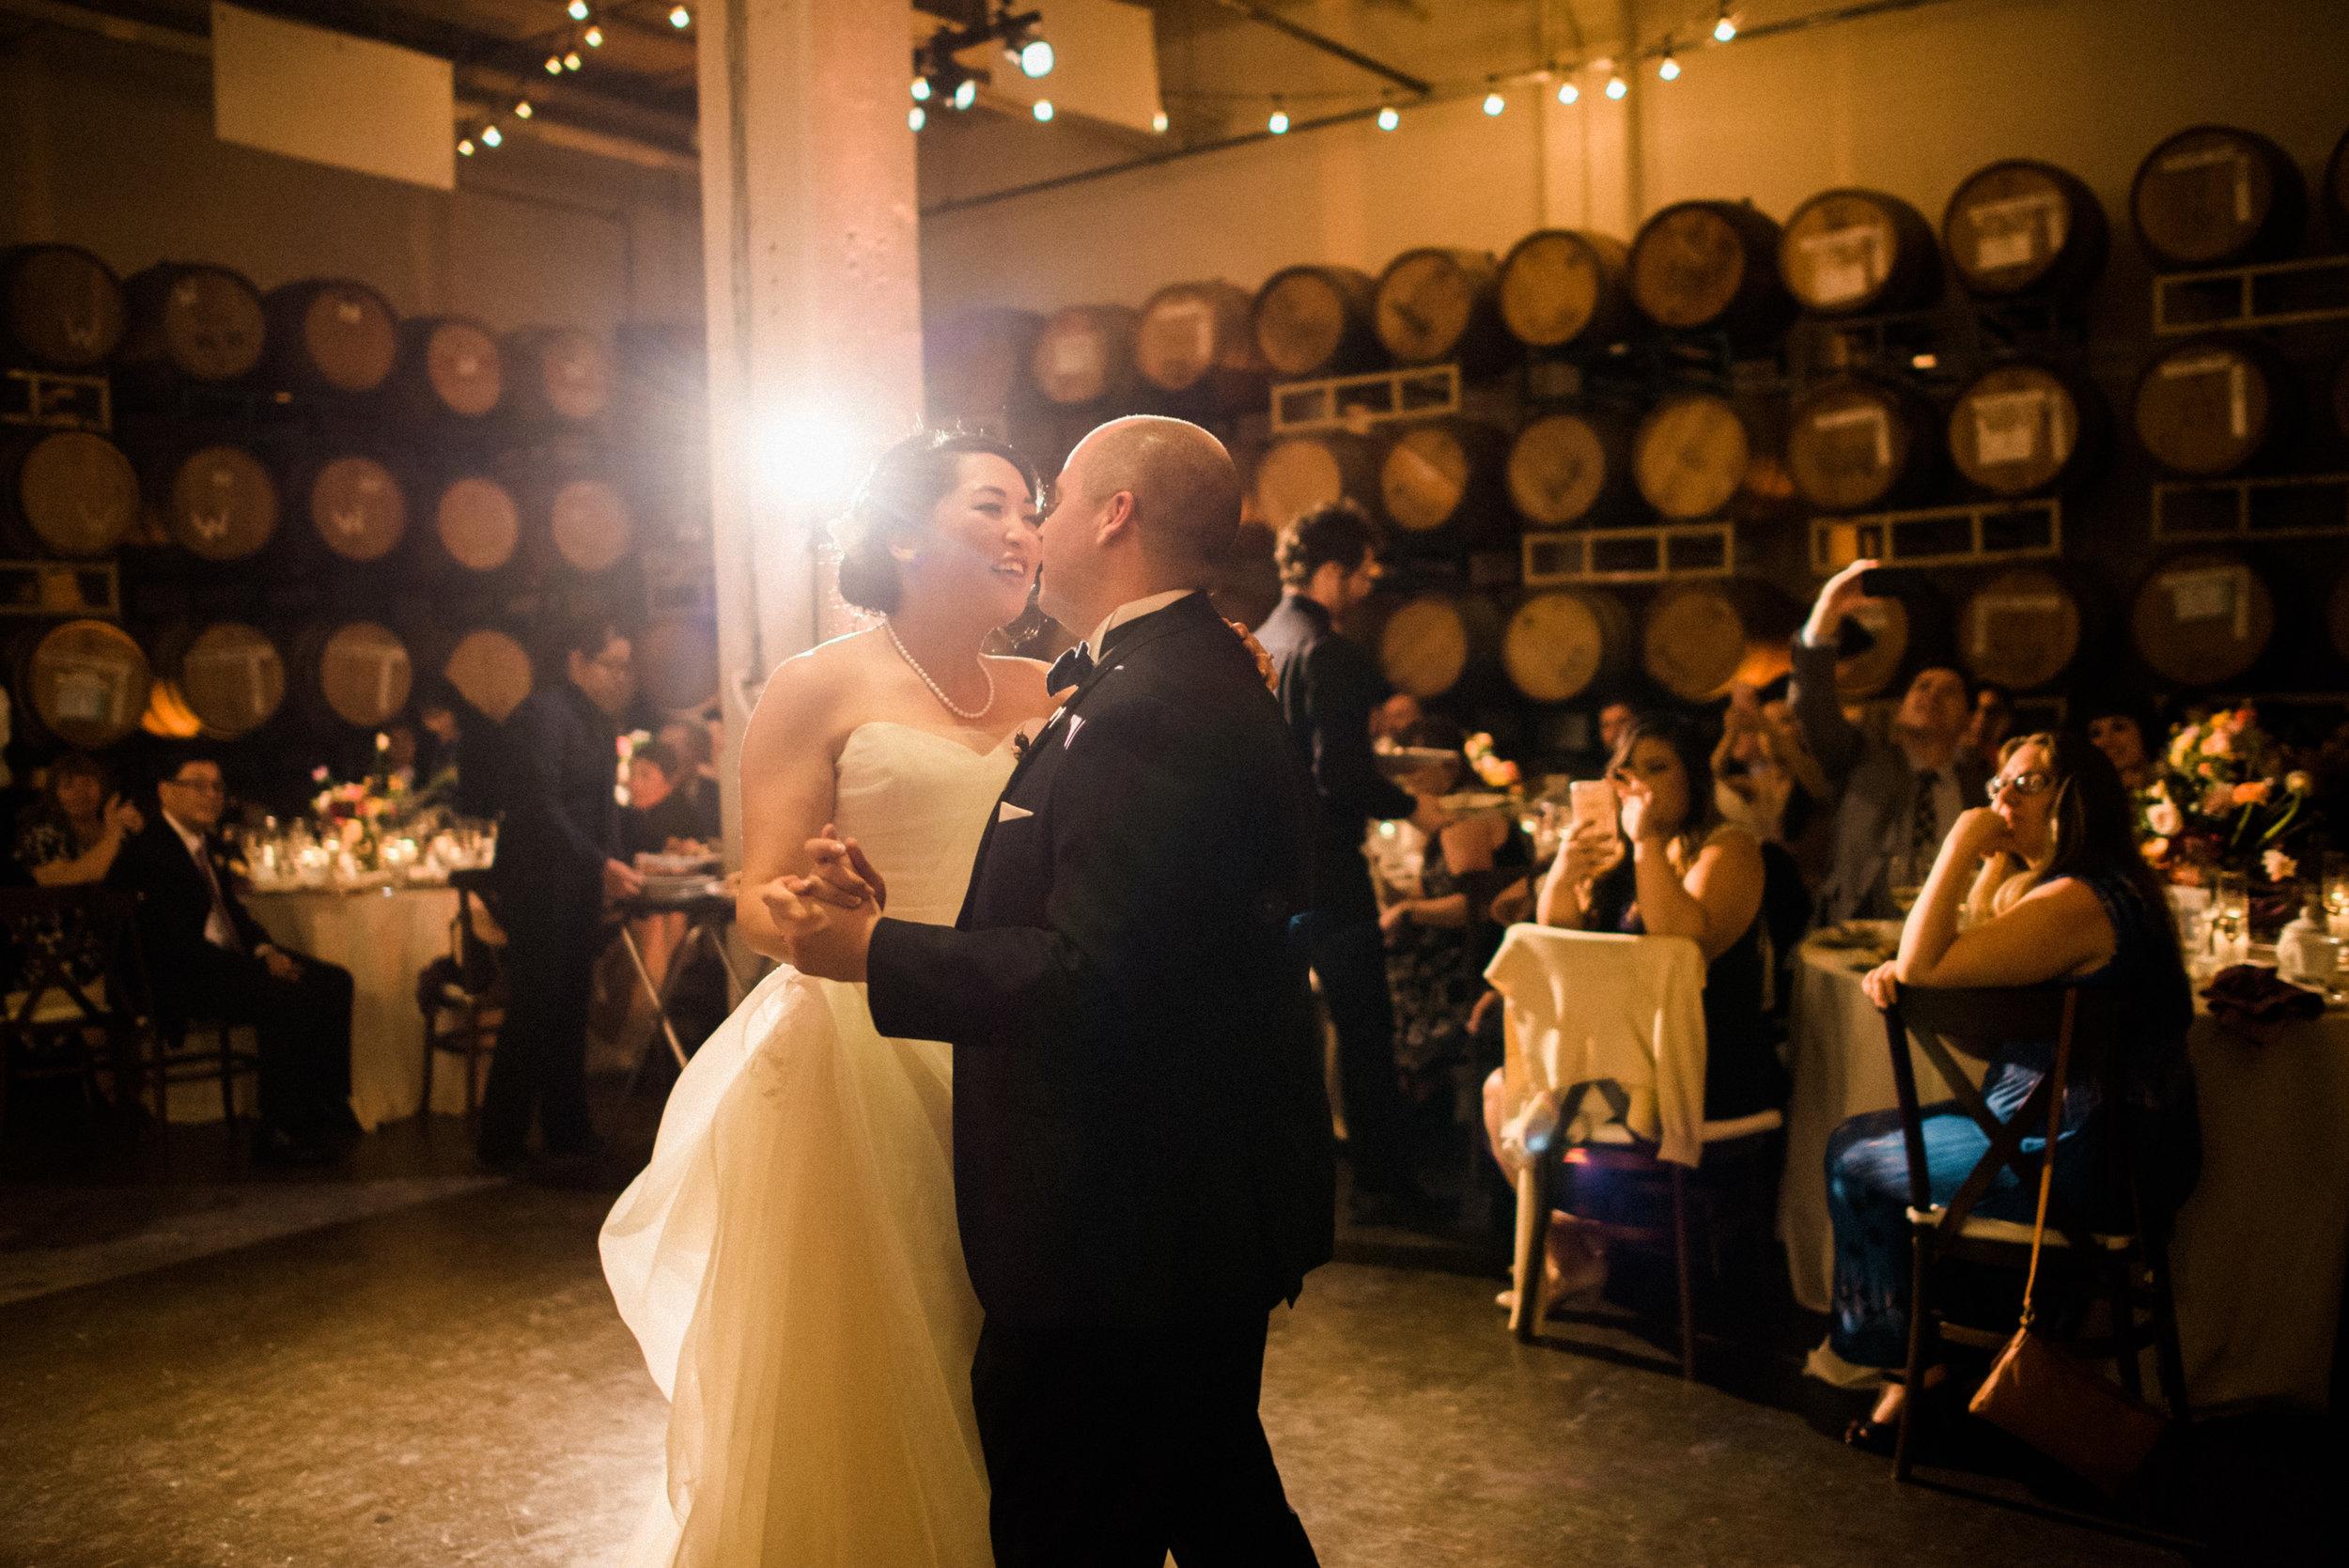 Swedenborgian Church Dogpatch Winery Wedding087.jpg